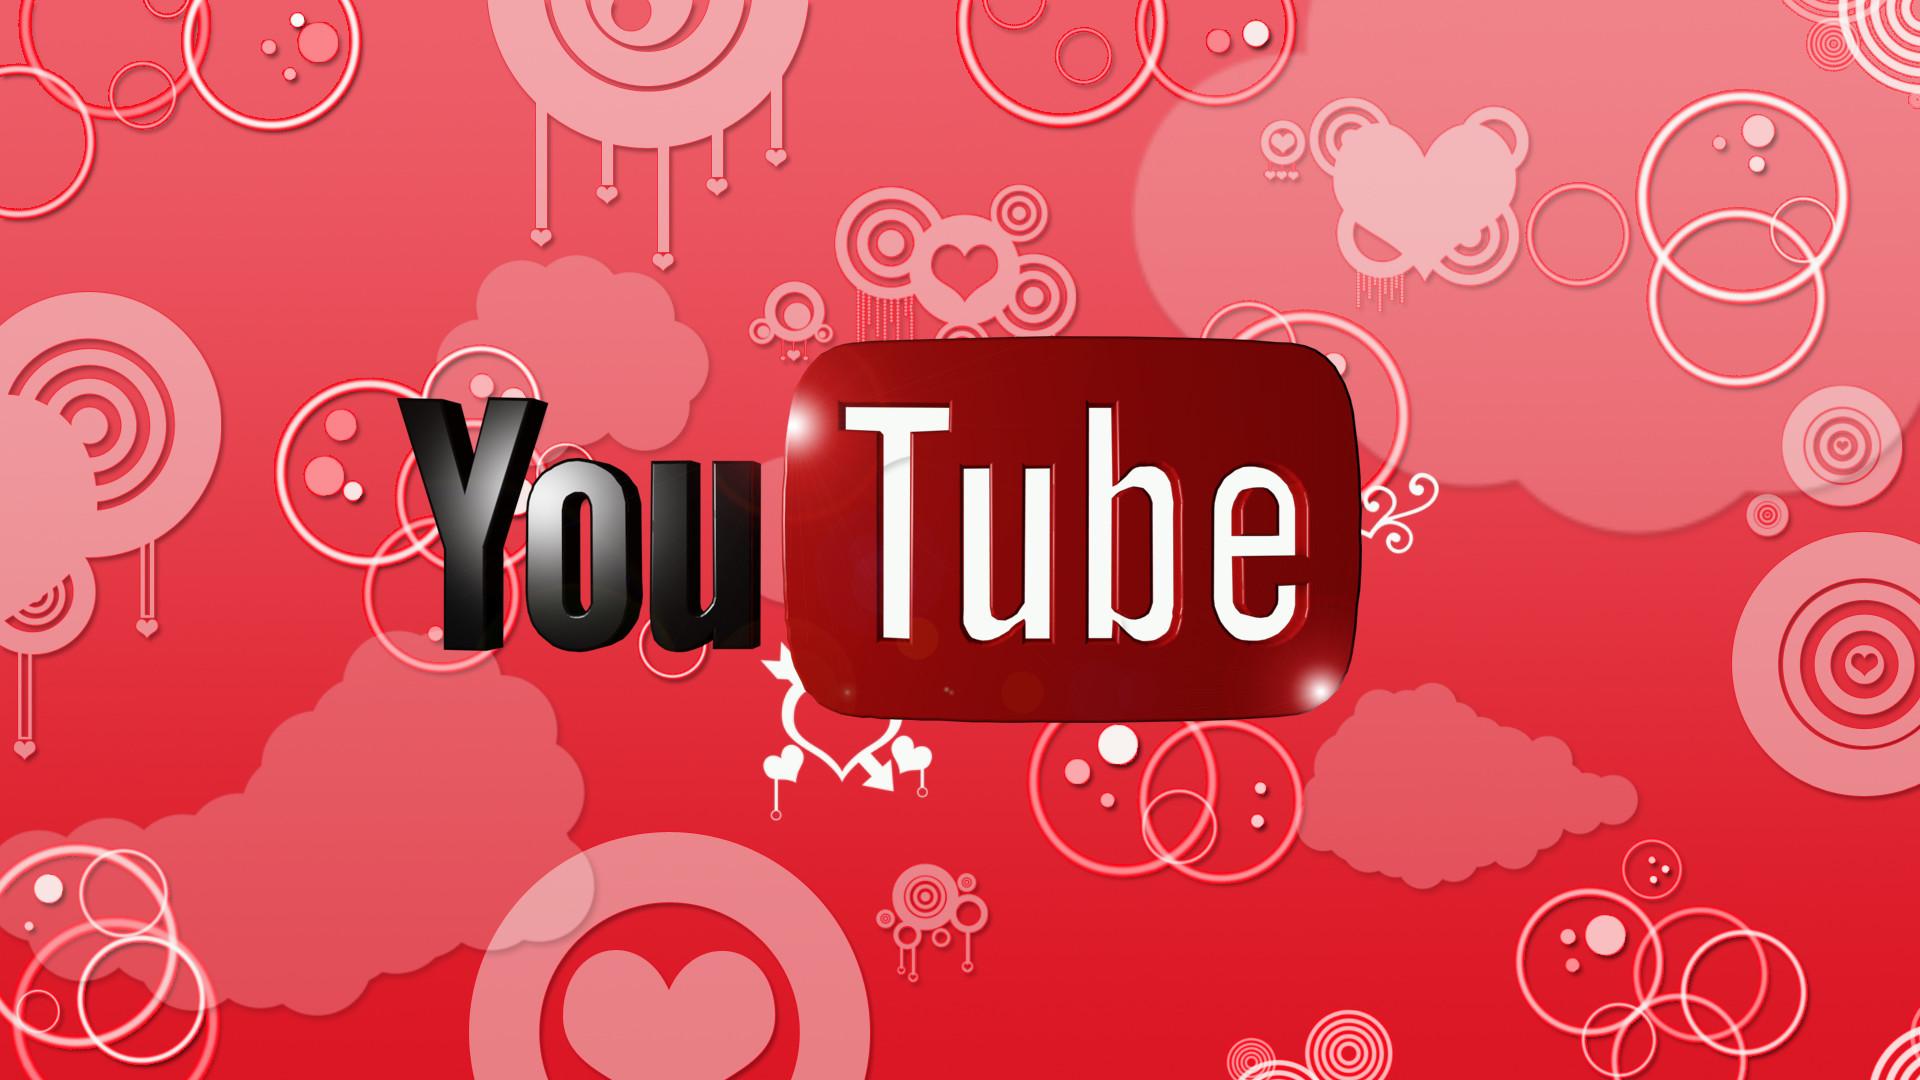 cool youtube logo